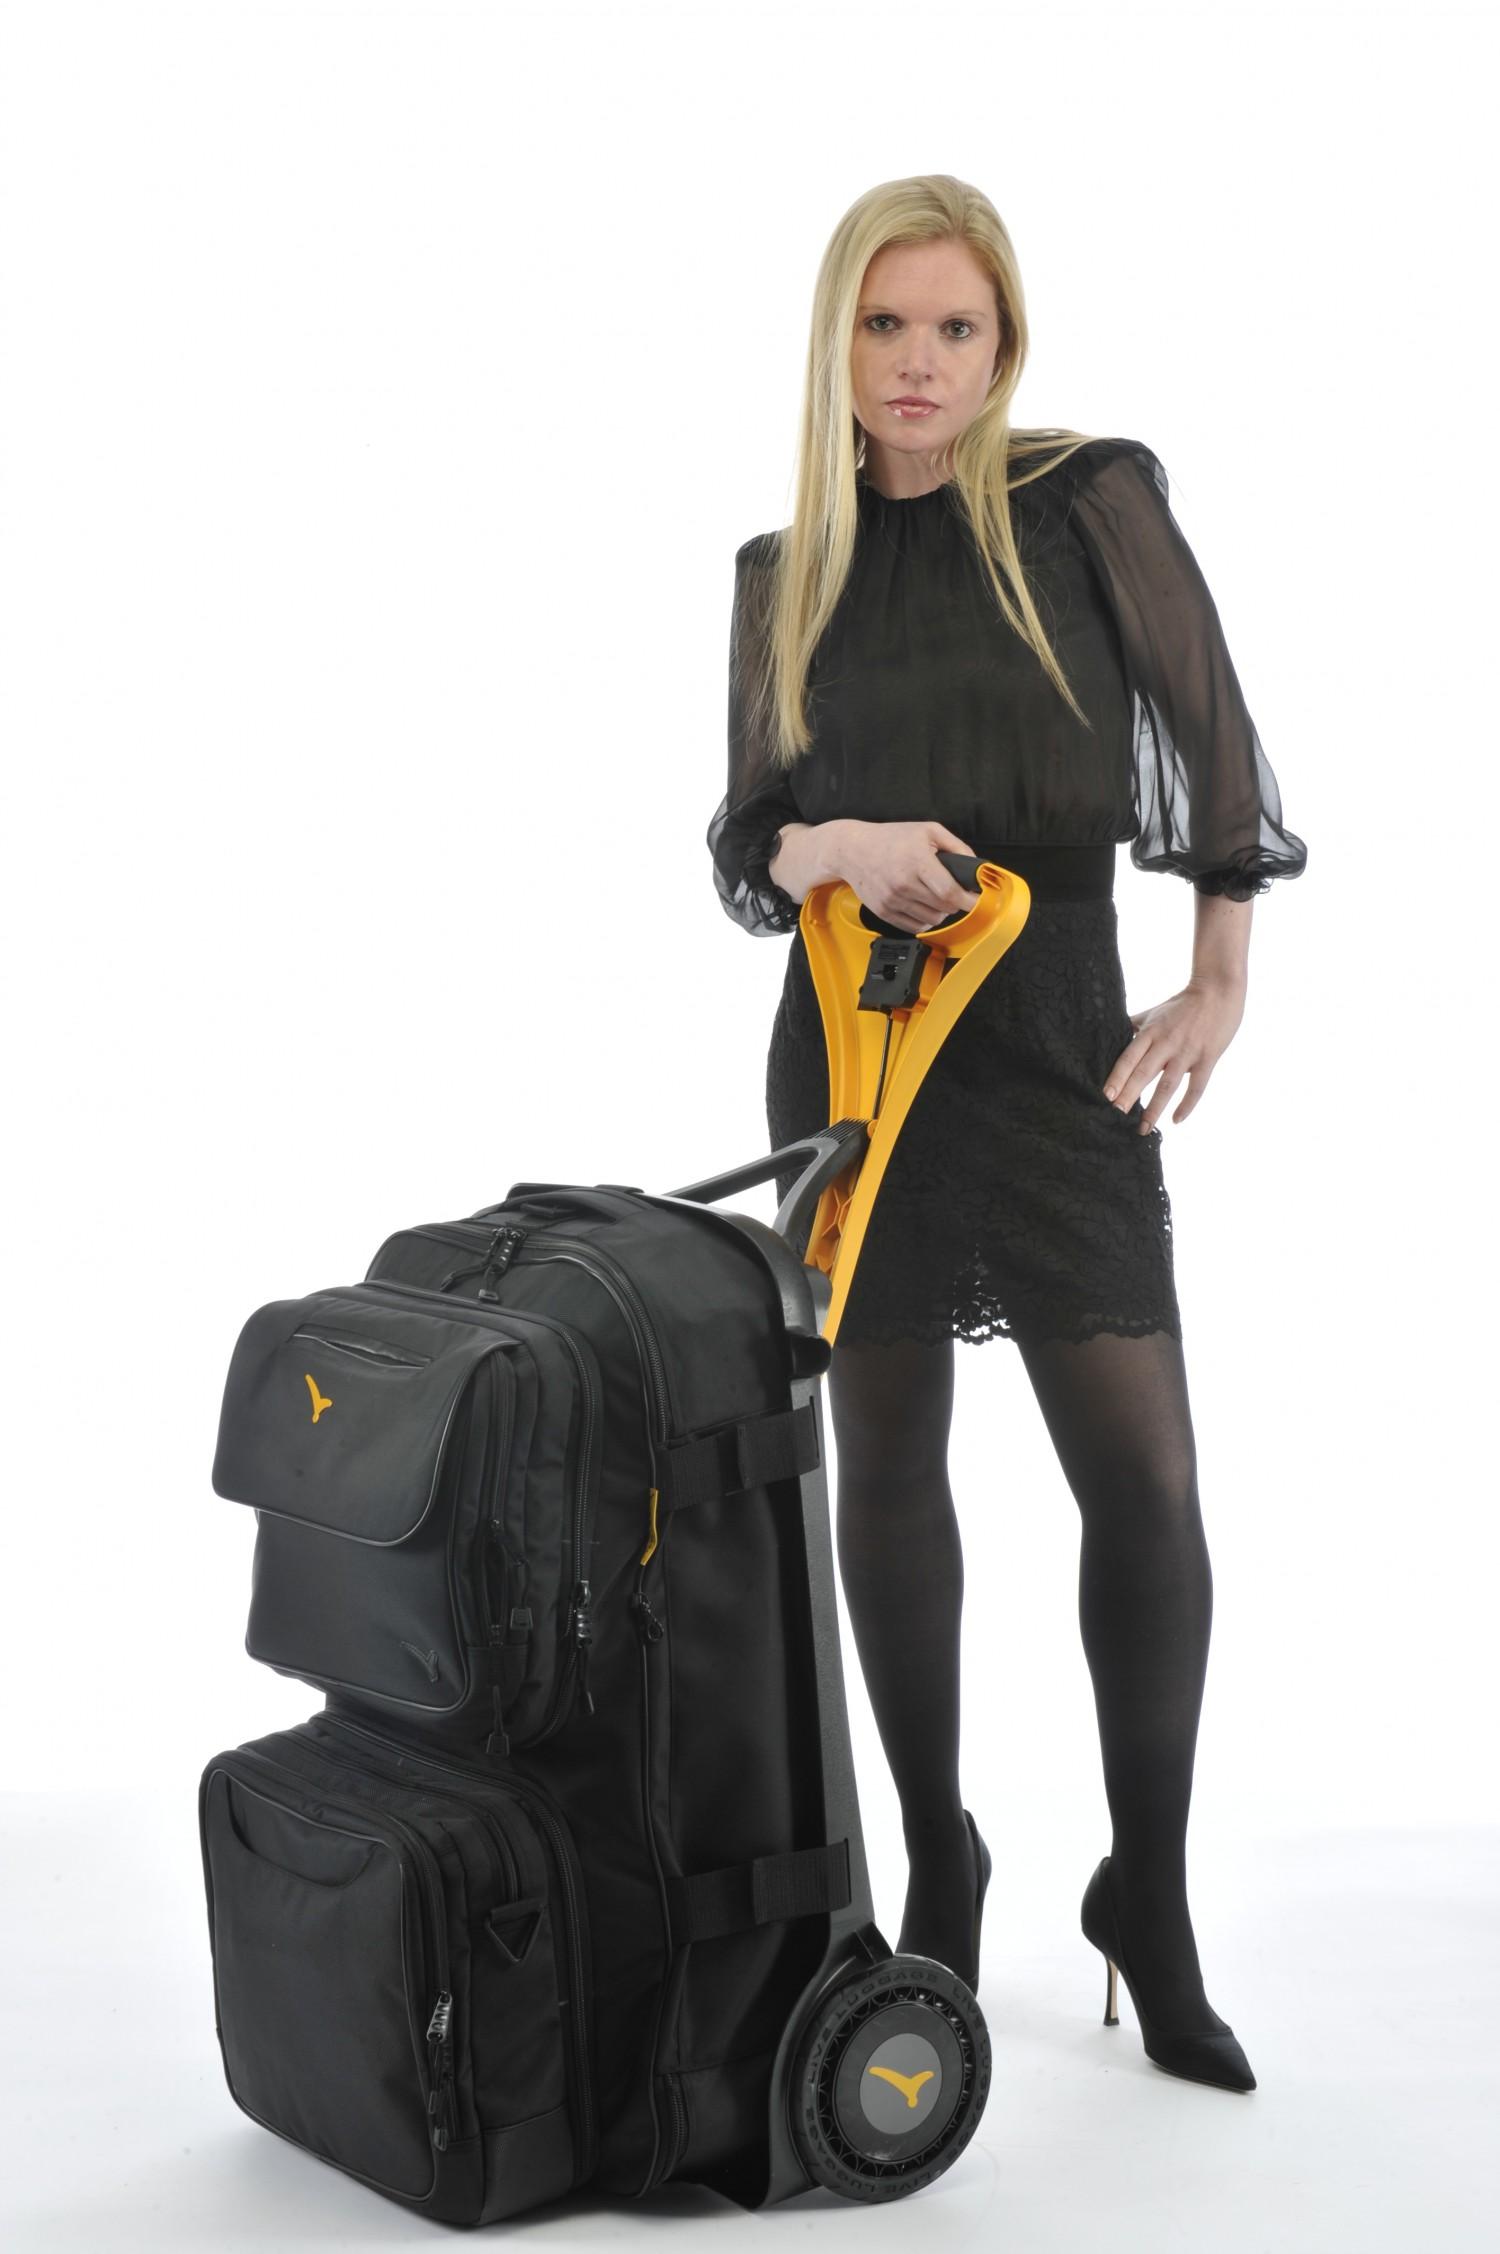 Live Luggage Hybrid AG Bag